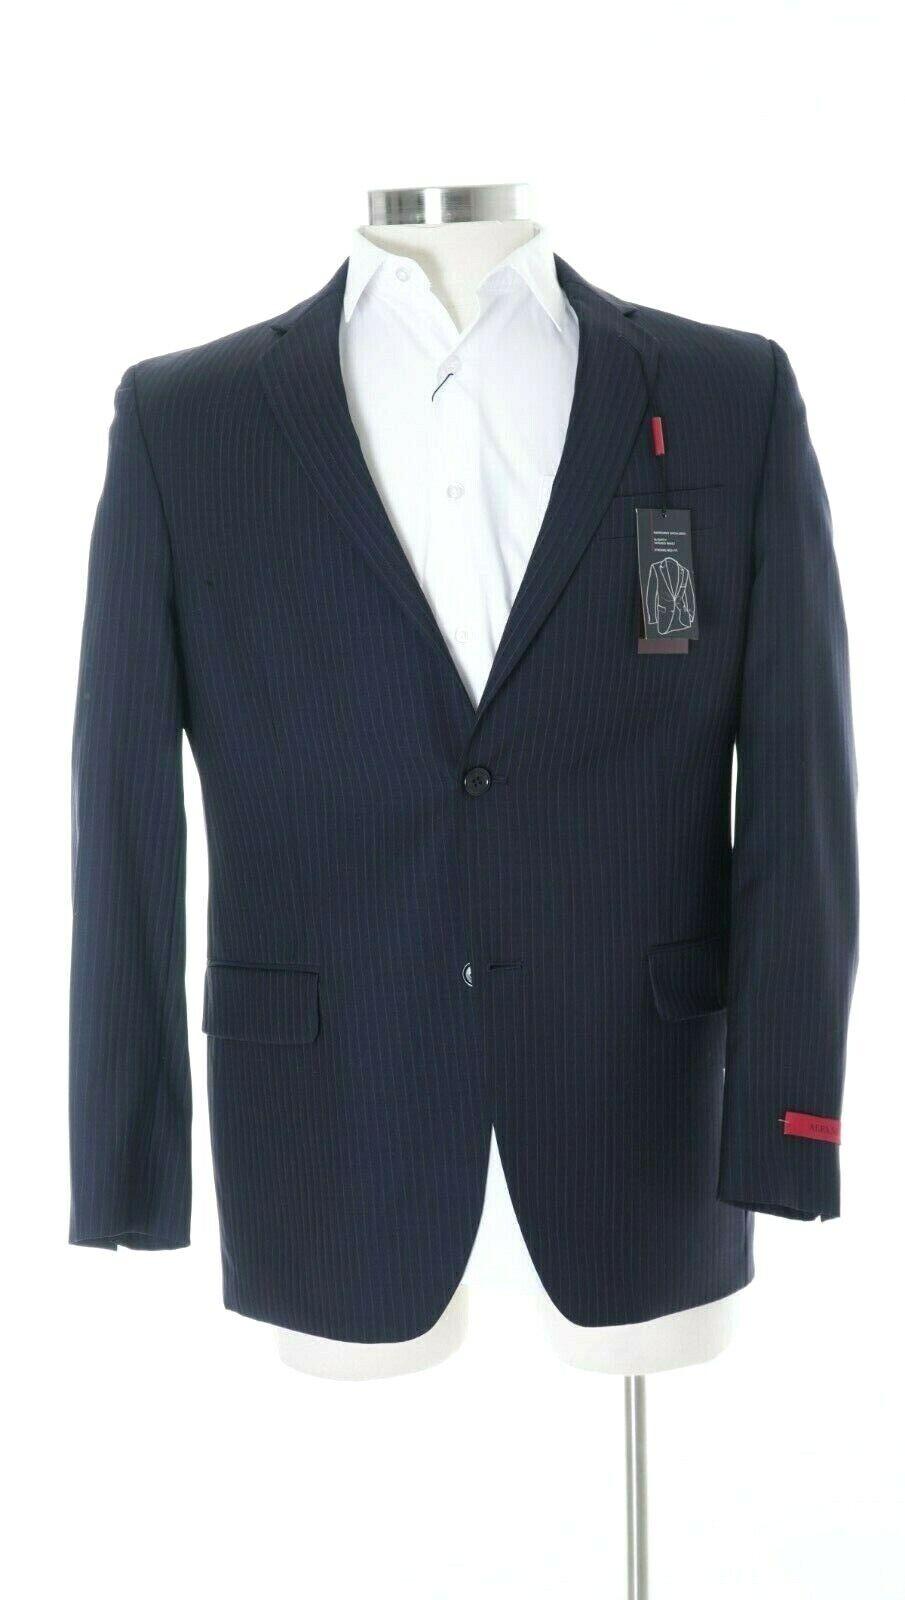 Alfani Slim Fit Navy bluee Striped Wool Blend Two Button Sportcoat Blazer 40R